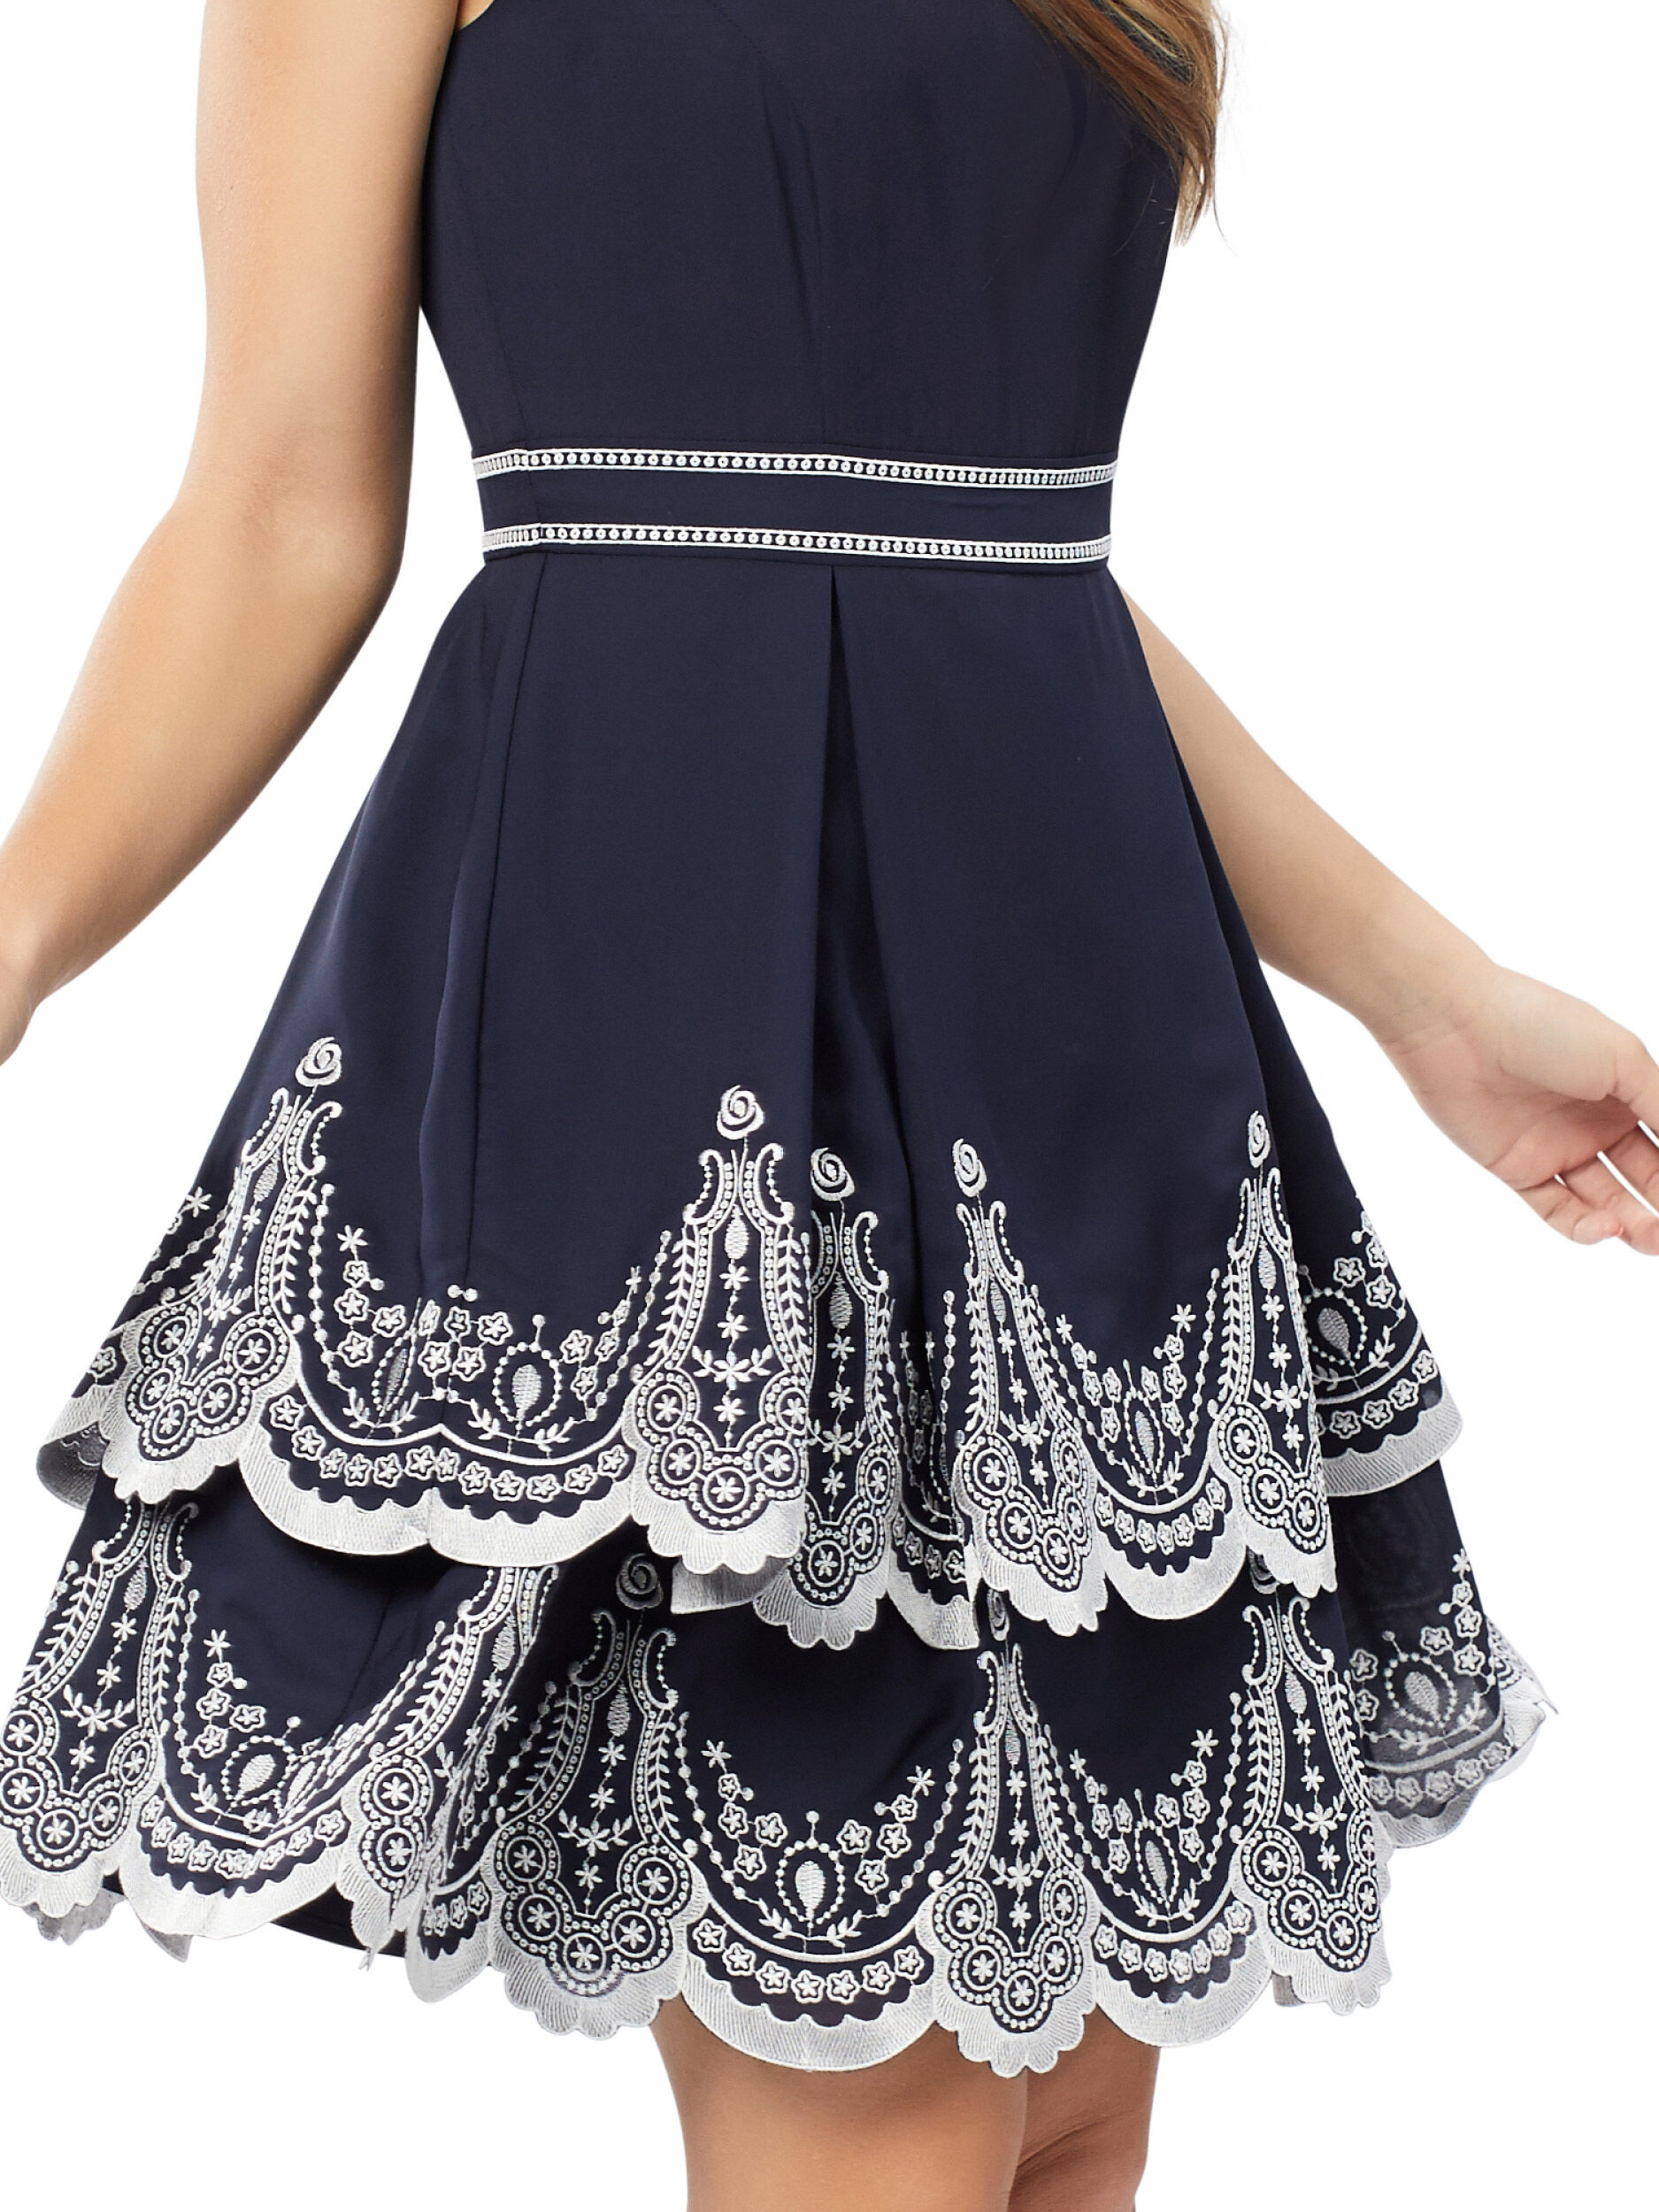 Basilica Dress